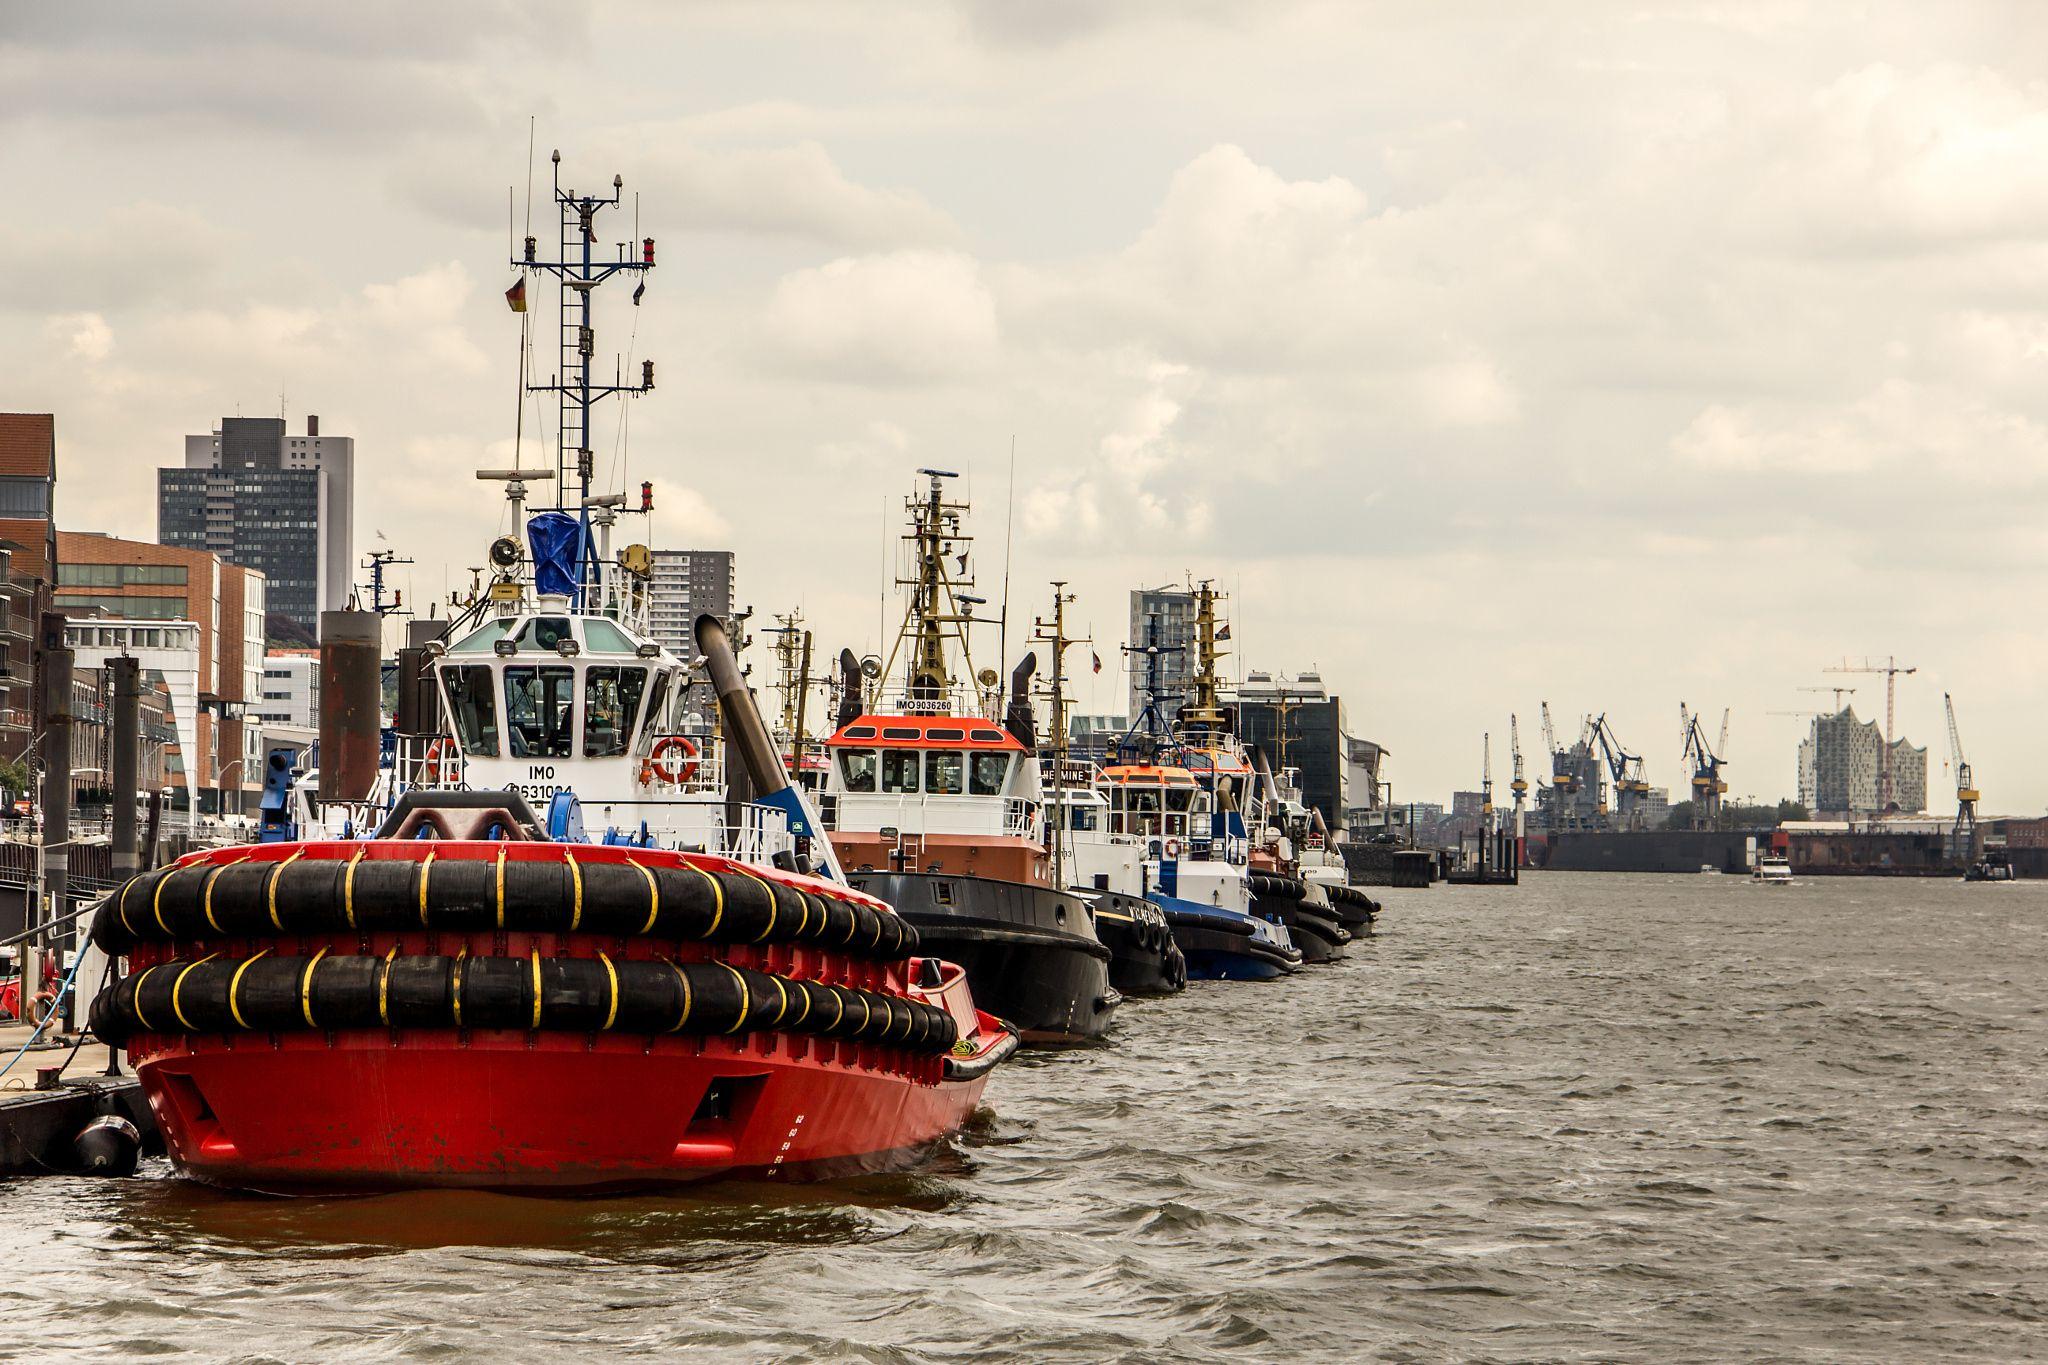 Haulers in the Port of Hamburg by Michael Schloz on 500px. #hauler #tugboat #portofhamburg #boats #elbe #hamburg #photography